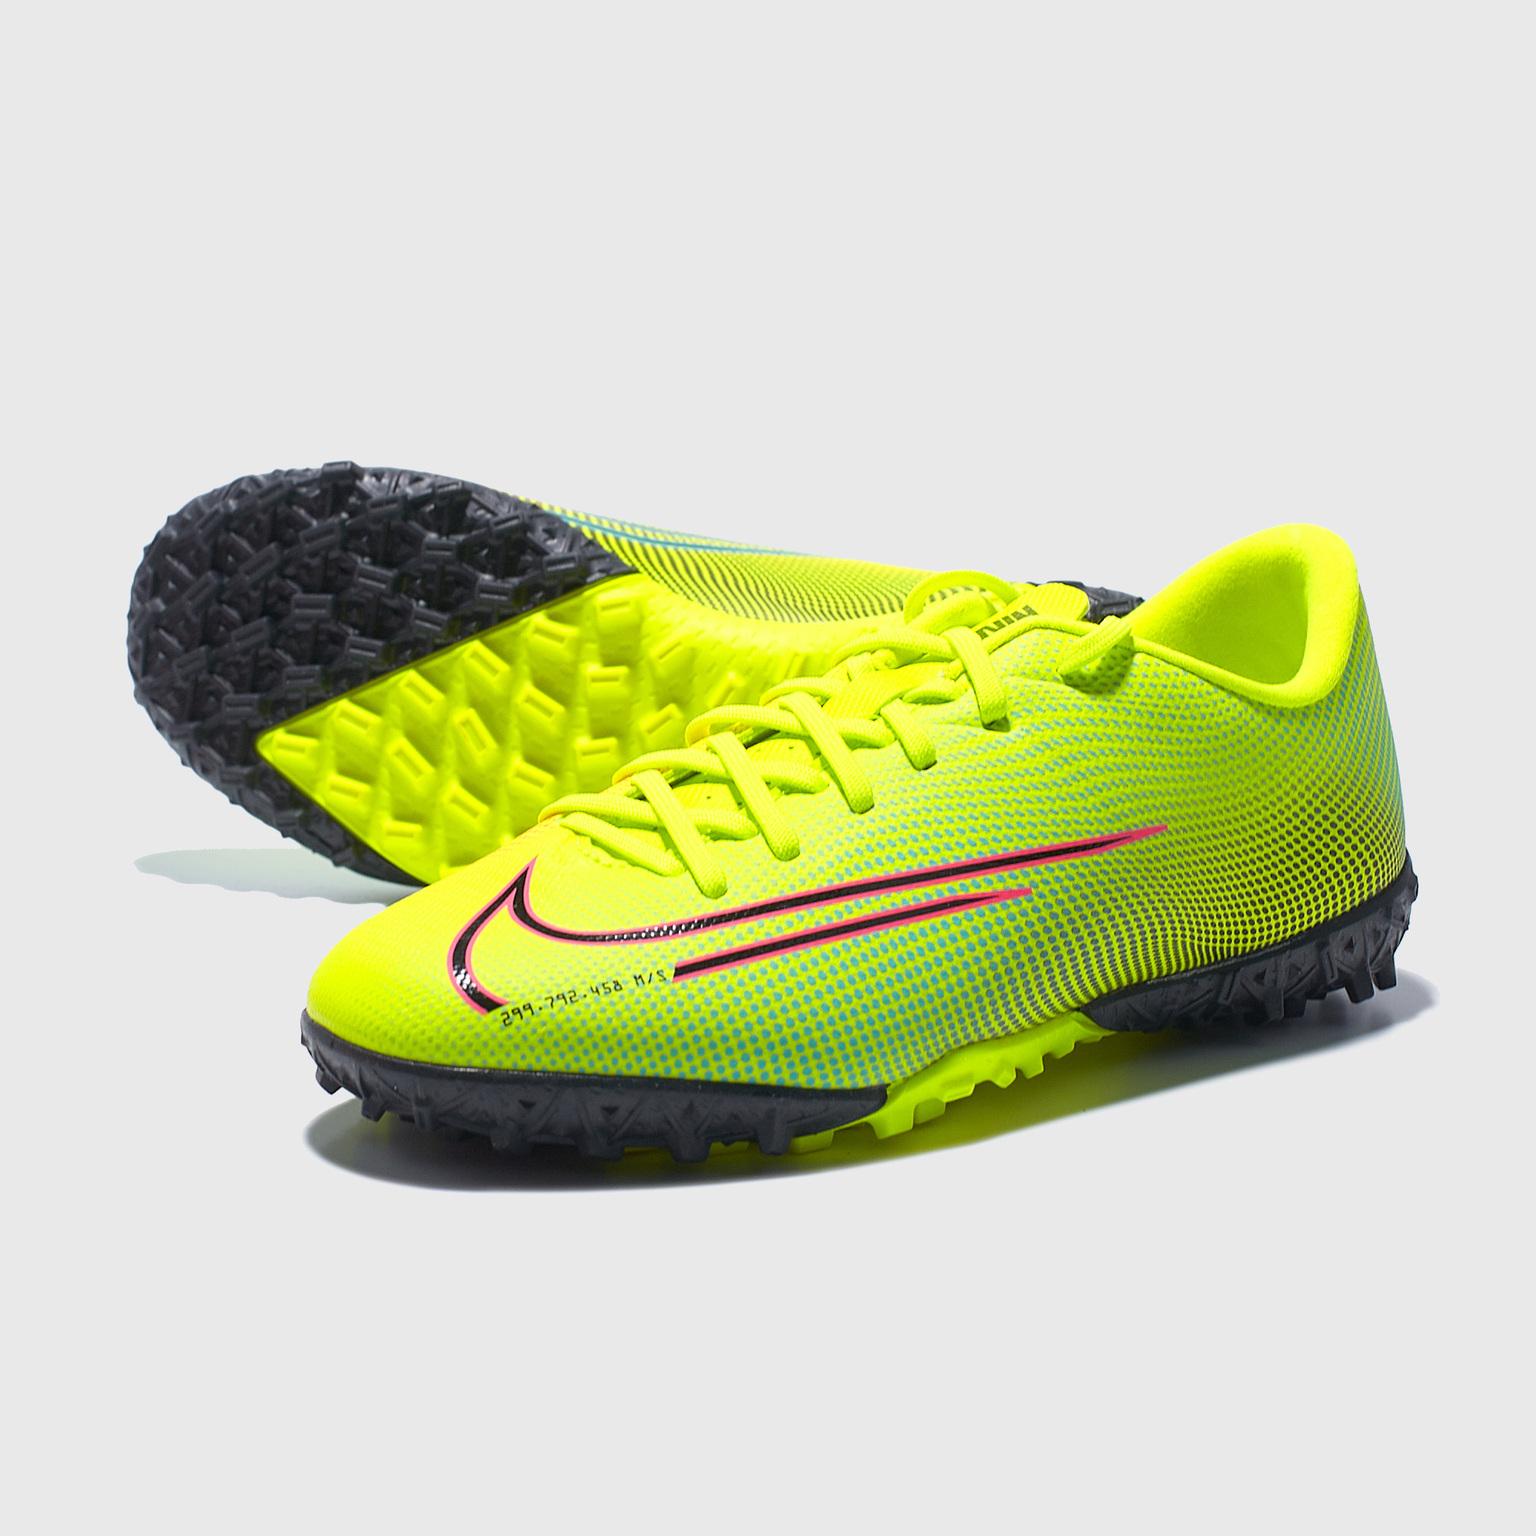 Шиповки детские Nike Vapor 13 Academy MDS TF CJ1178-703 nike vapor gymsack